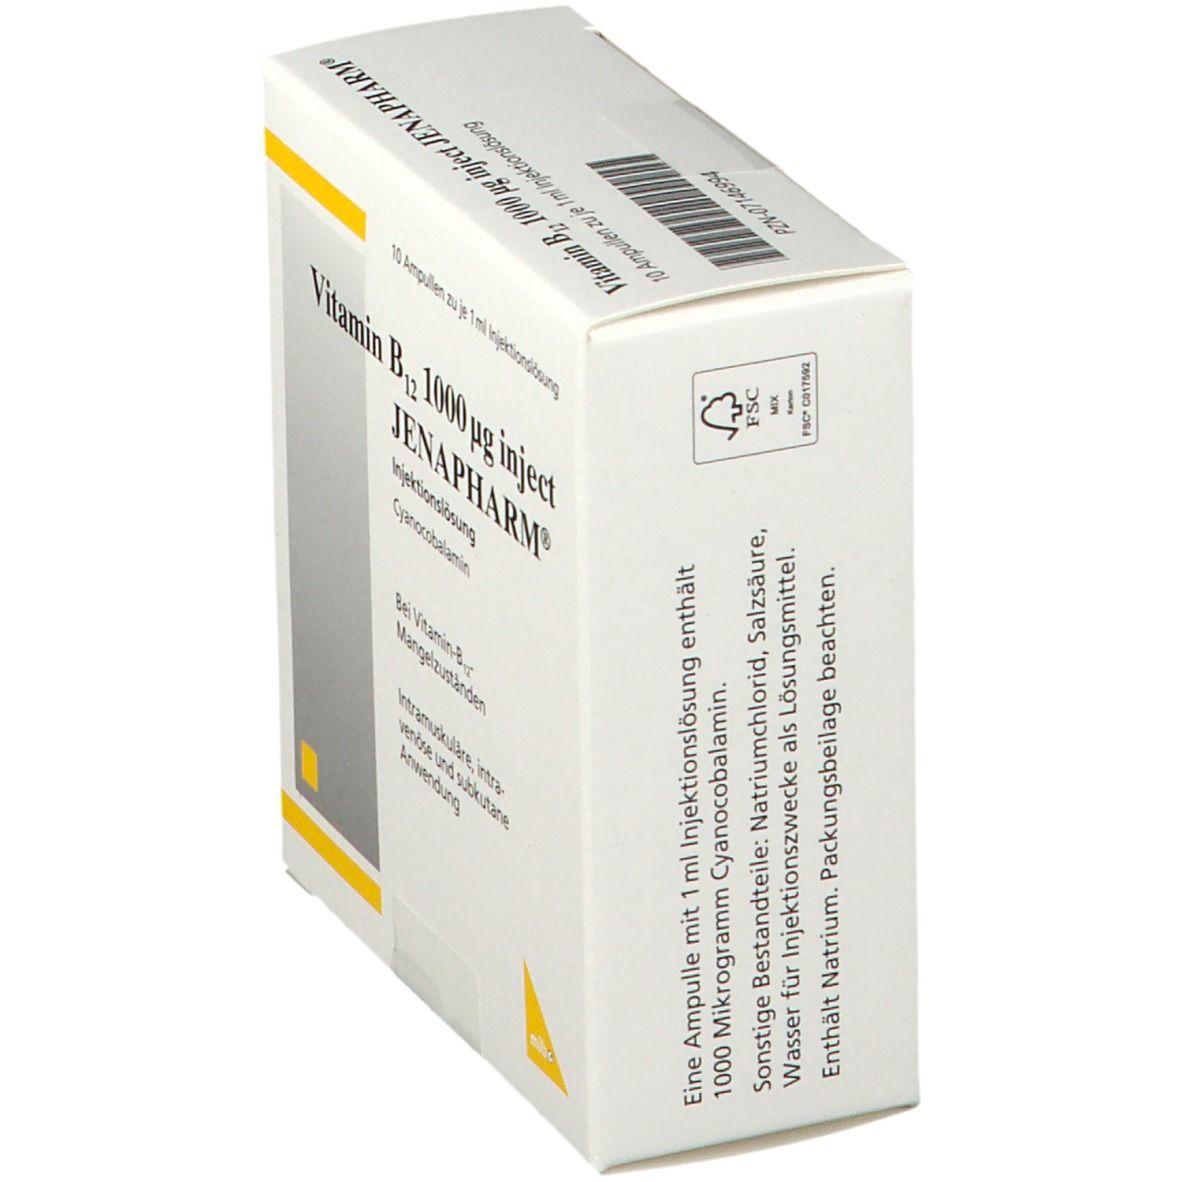 Vitamin B 12 1 mg Inject Jenapharm® Ampullen